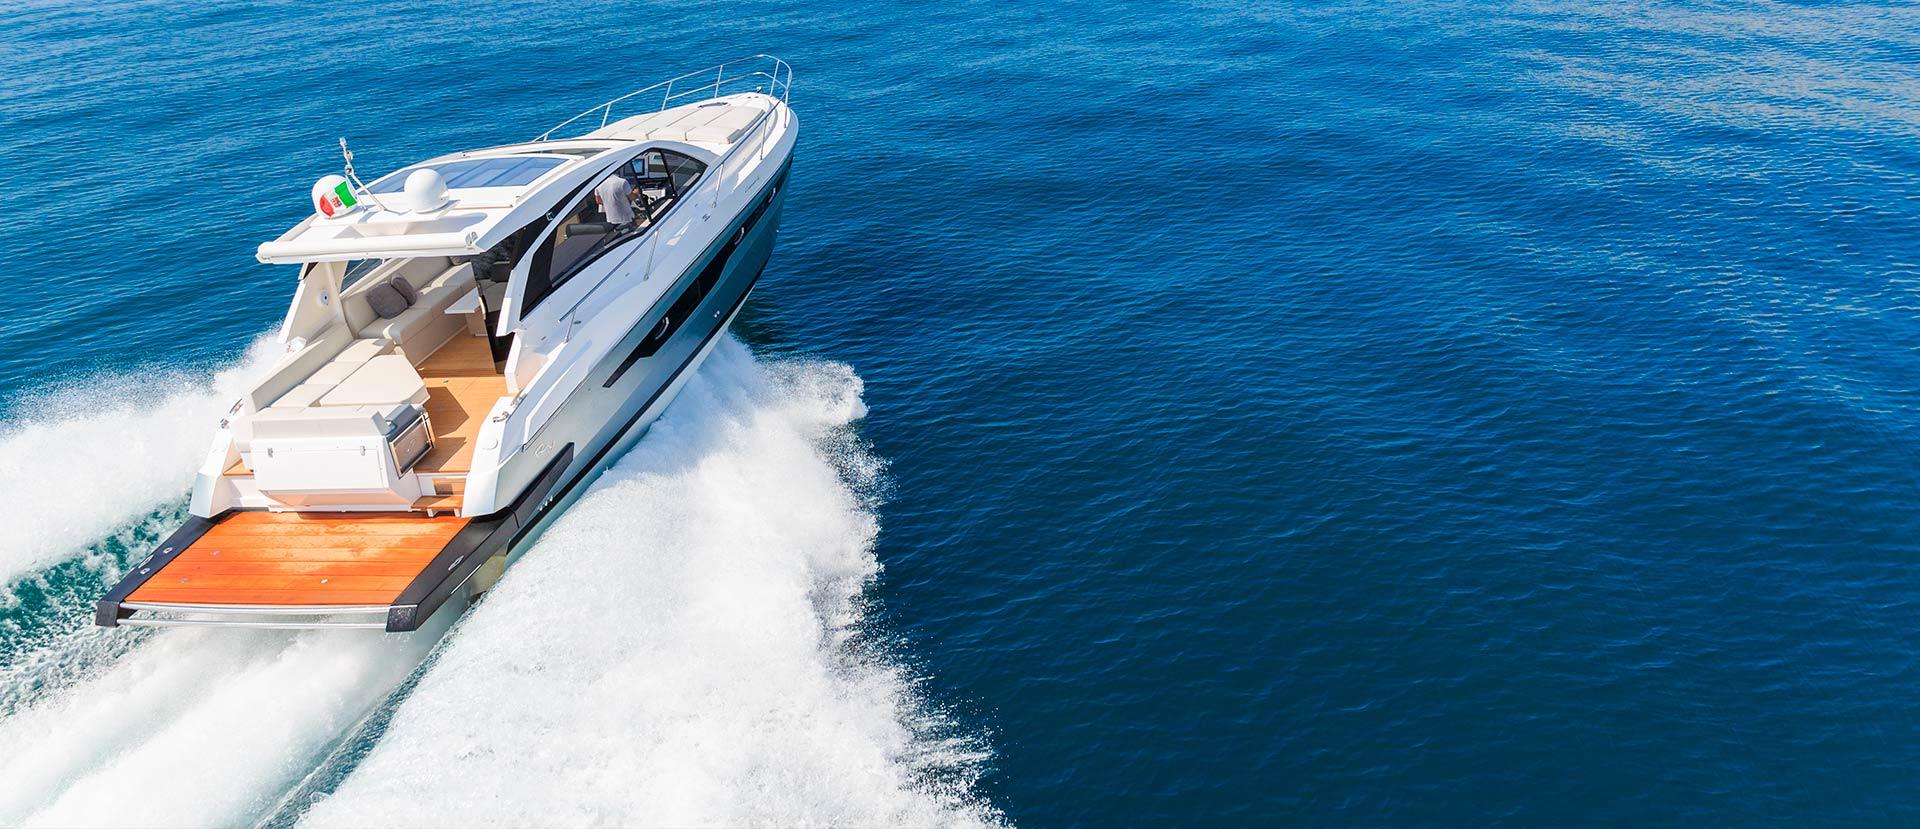 Slider Boat - Xperience Florida Marine